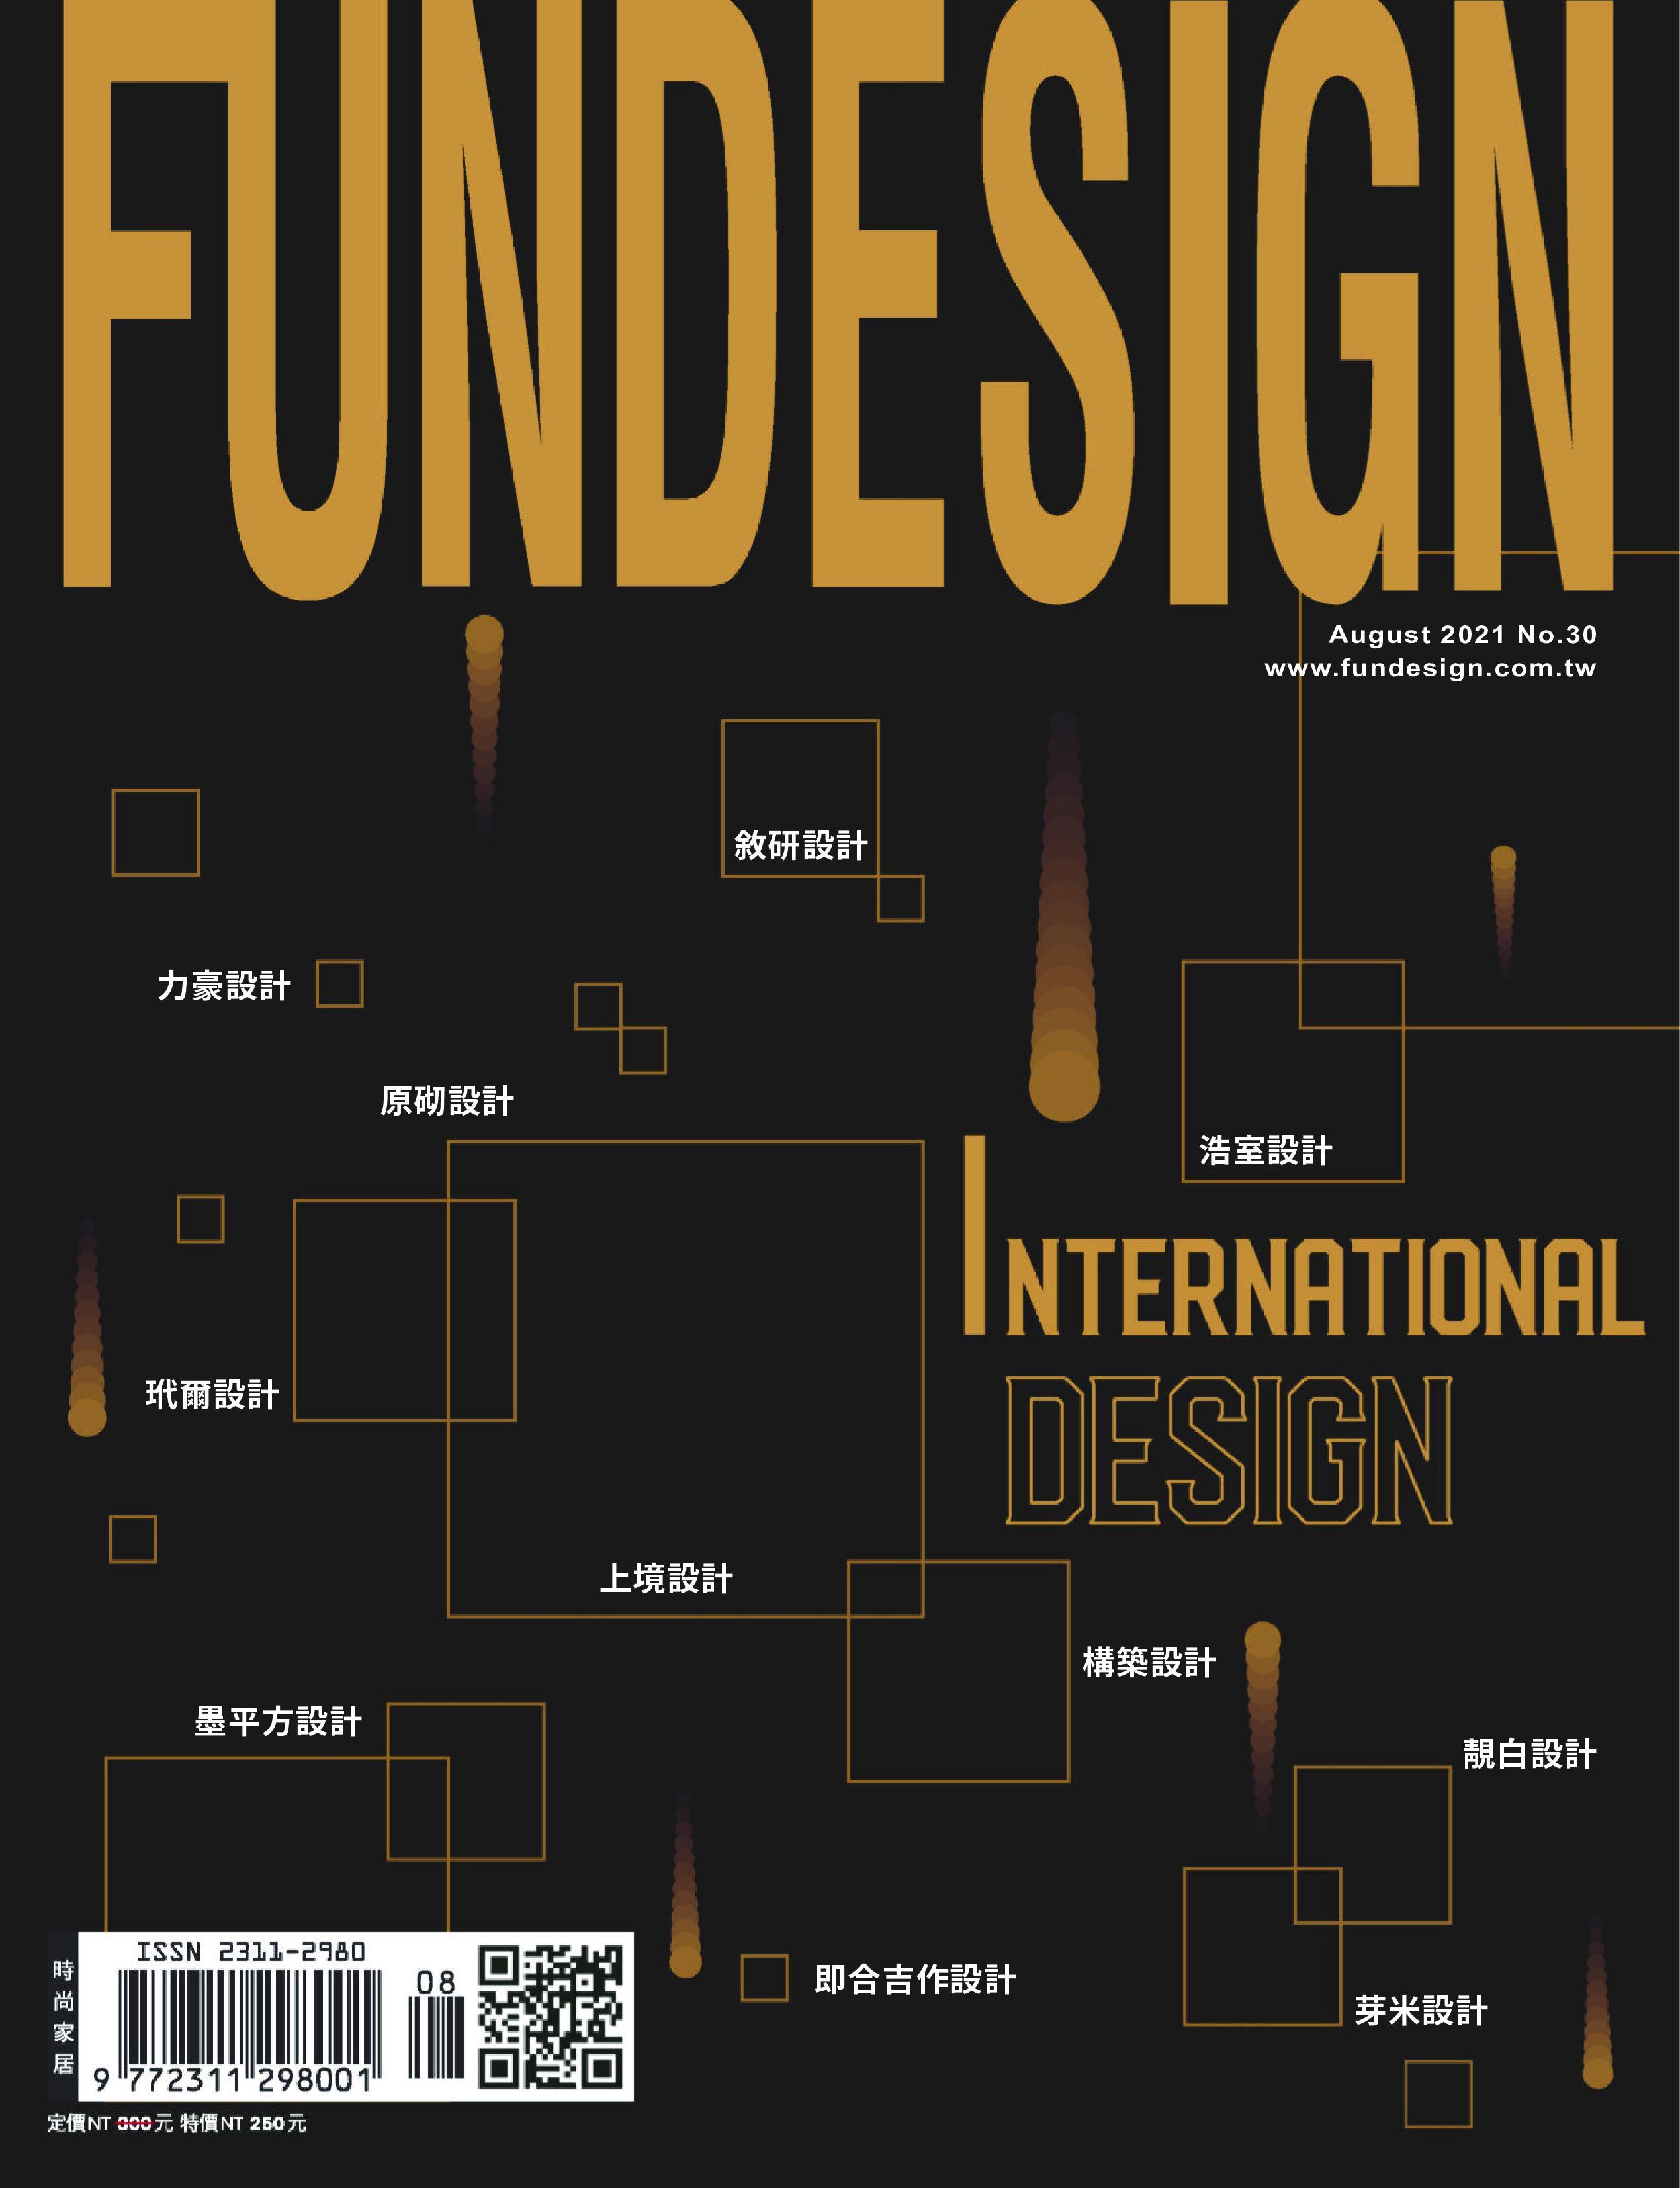 Fundesign 瘋設計 - 九月 02, 2021